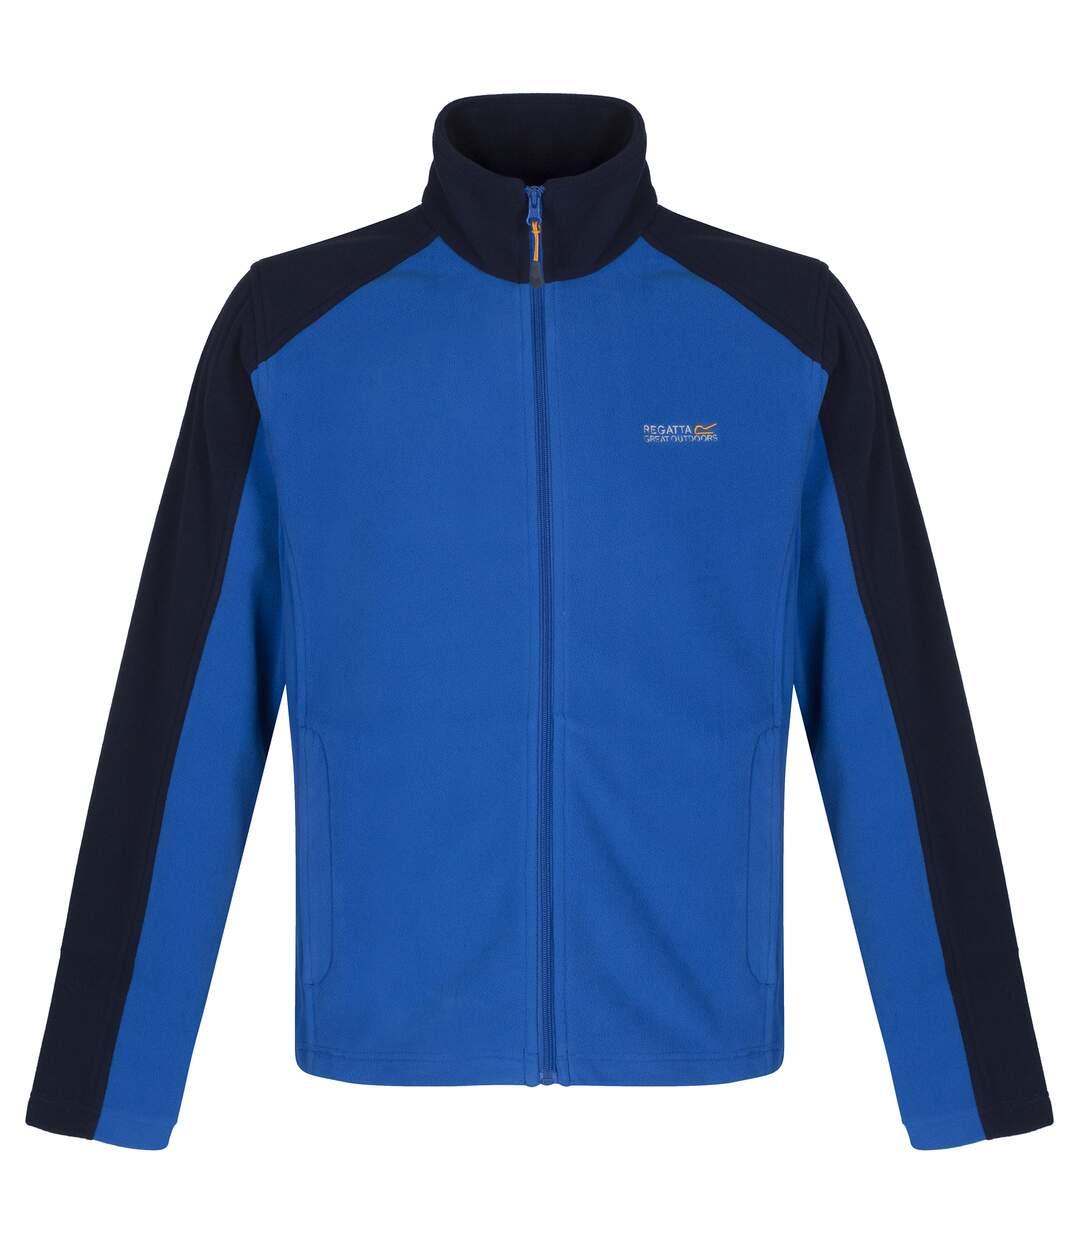 Regatta Great Outdoors Mens Hedman II Two Tone Full Zip Fleece Jacket (Oxford Blue/Navy) - UTRG1398